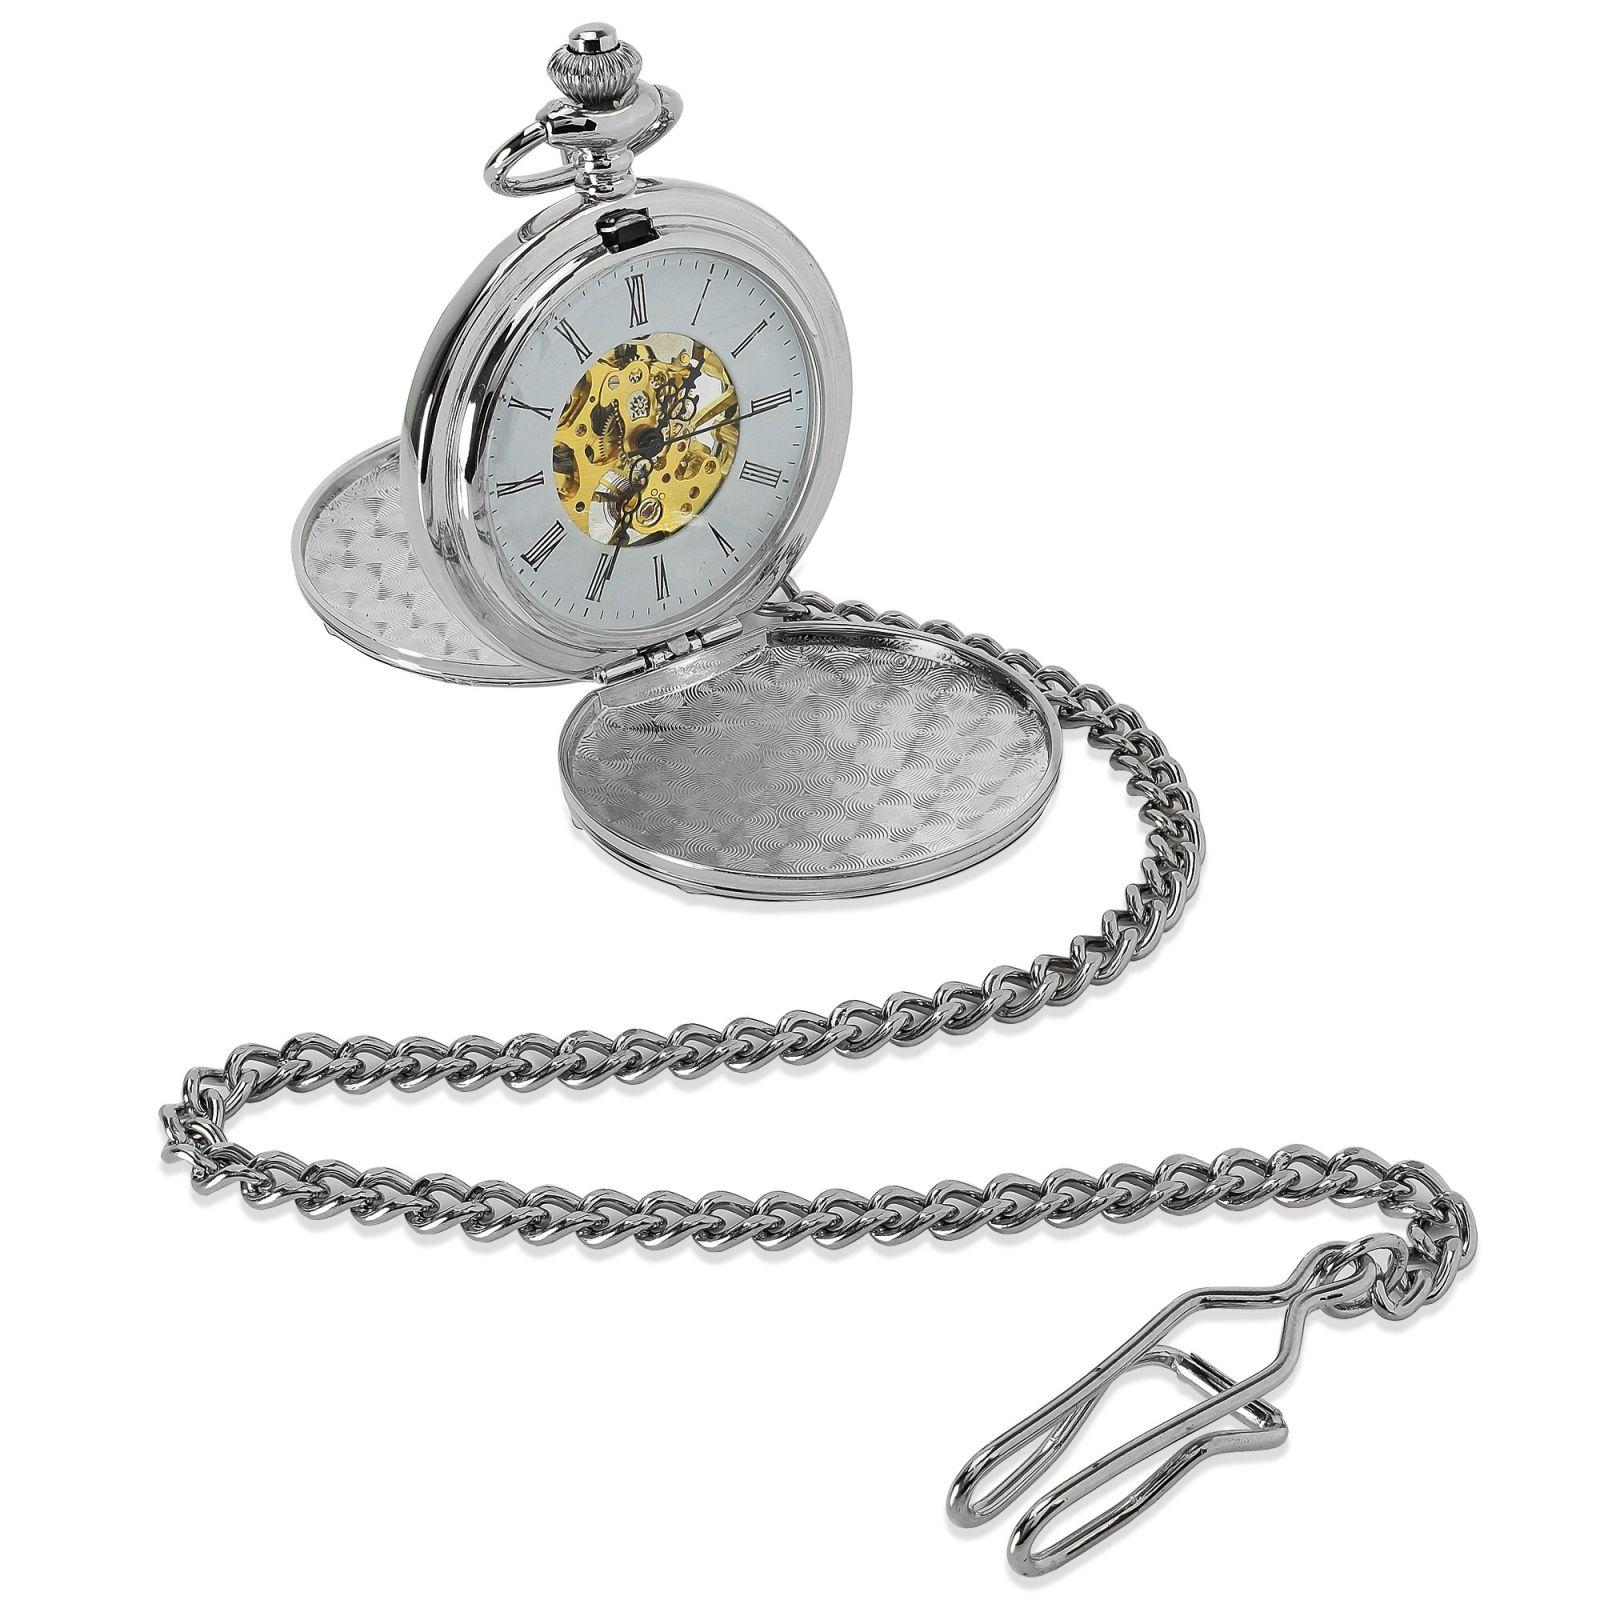 Silver Mechanical Roman Pocket Watch